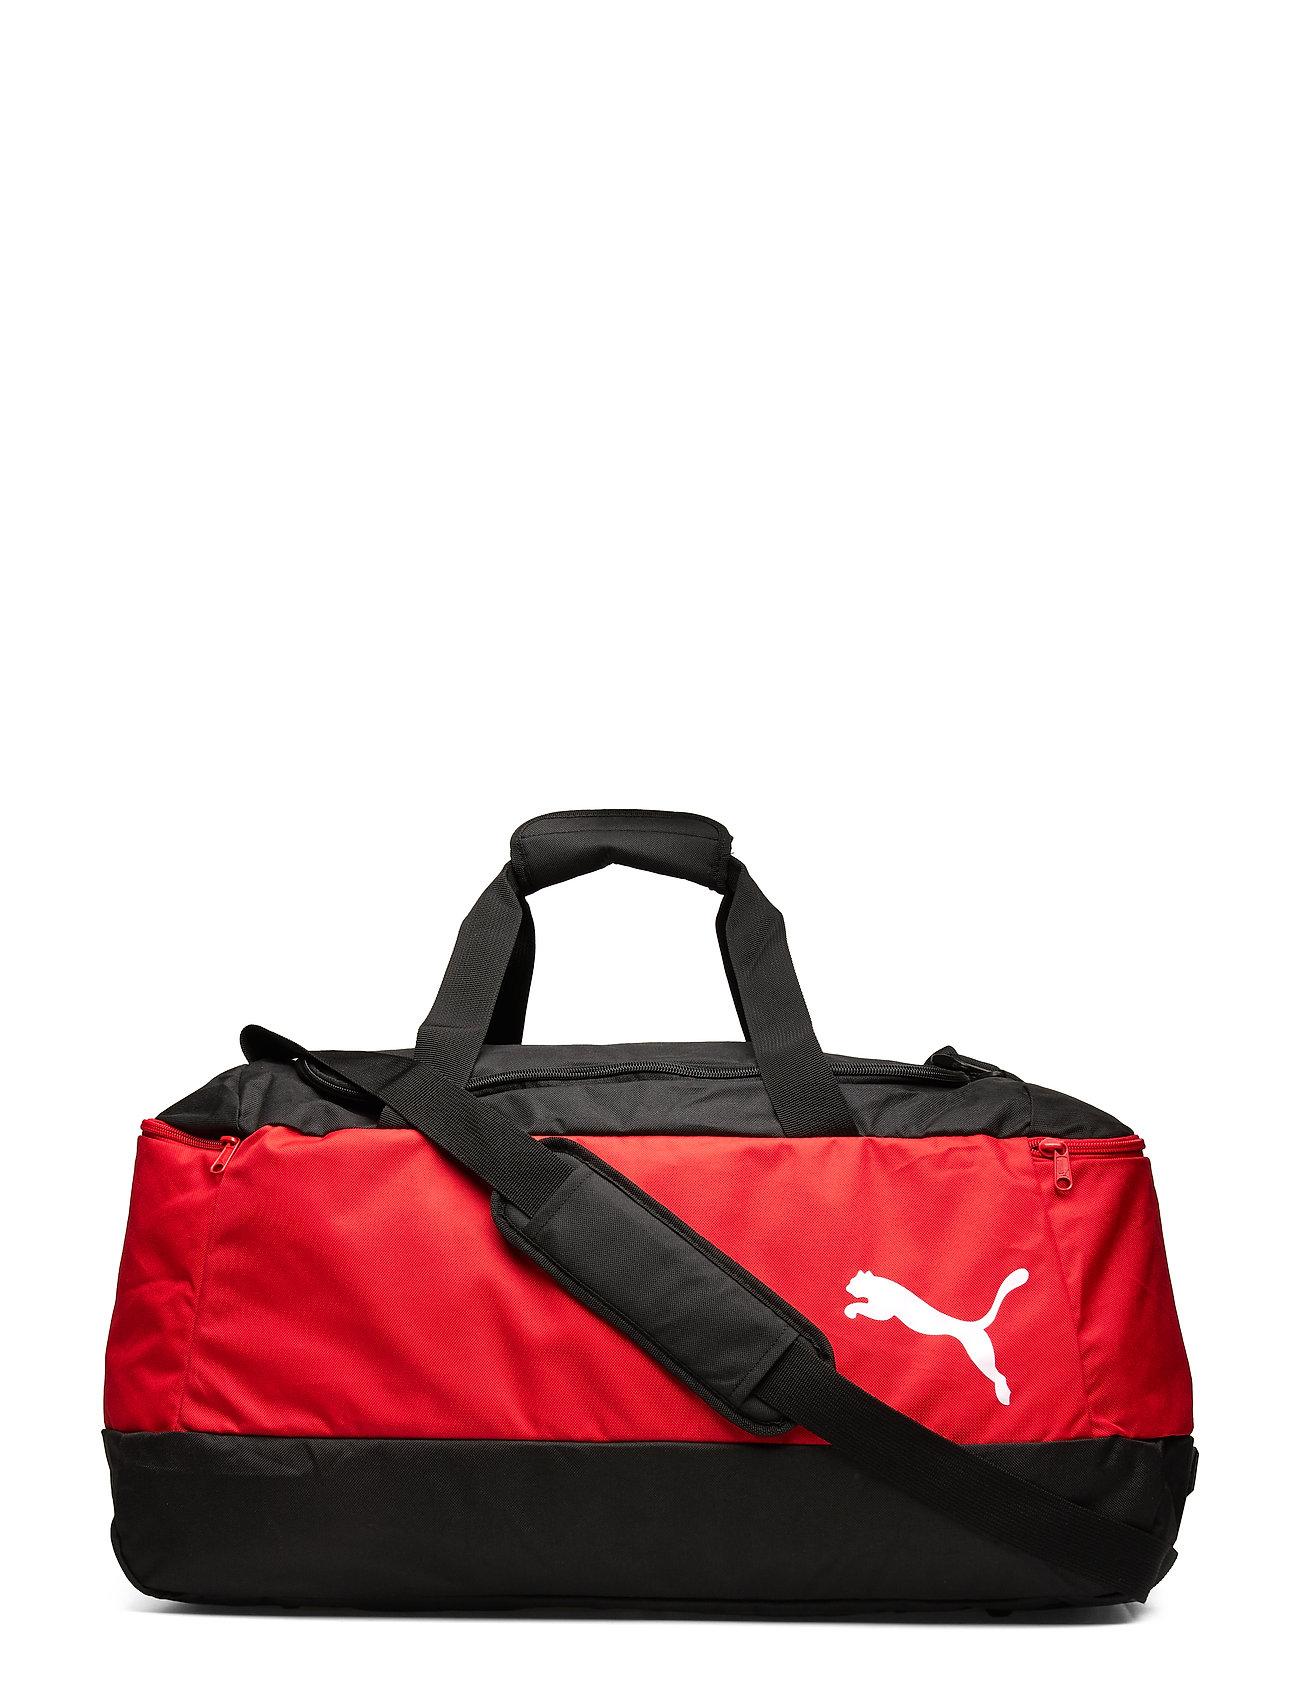 PUMA Pro Training II Medium Bag - PUMA RED-PUMA BLACK